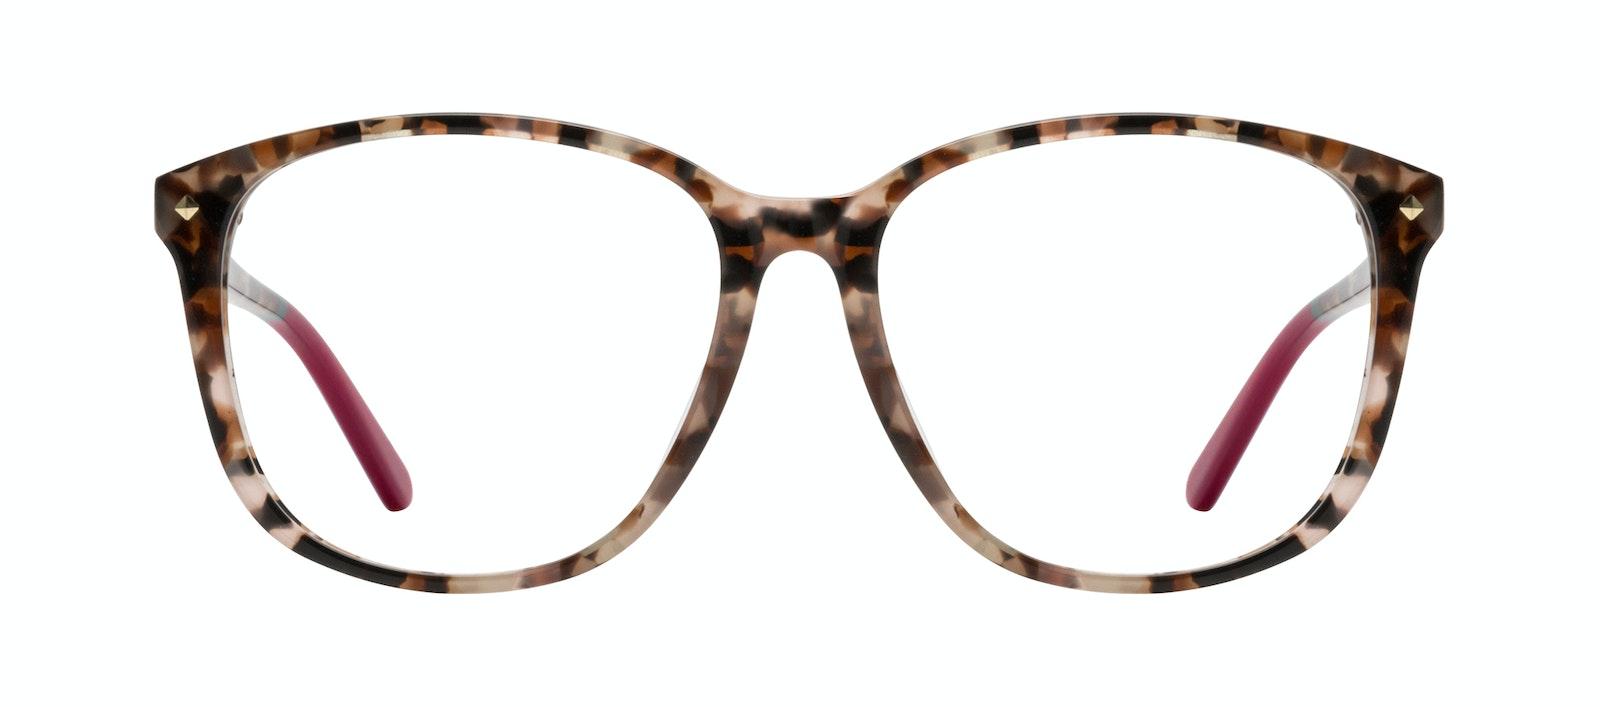 Affordable Fashion Glasses Square Eyeglasses Women Lauren Pink Tortoise Front